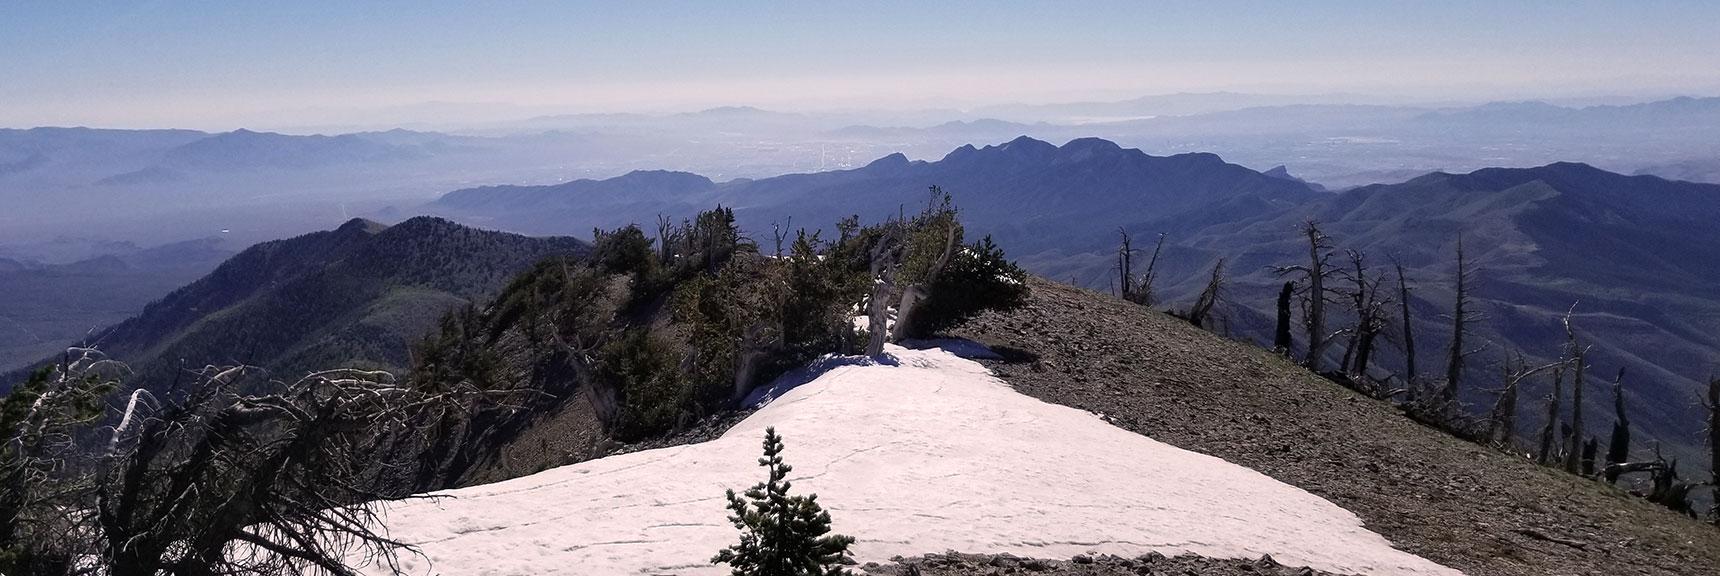 La Madre Mountain Wilderness, Turtlehead Peak, Keystone Thrust Viewed from Griffith Peak Summit, Nevada